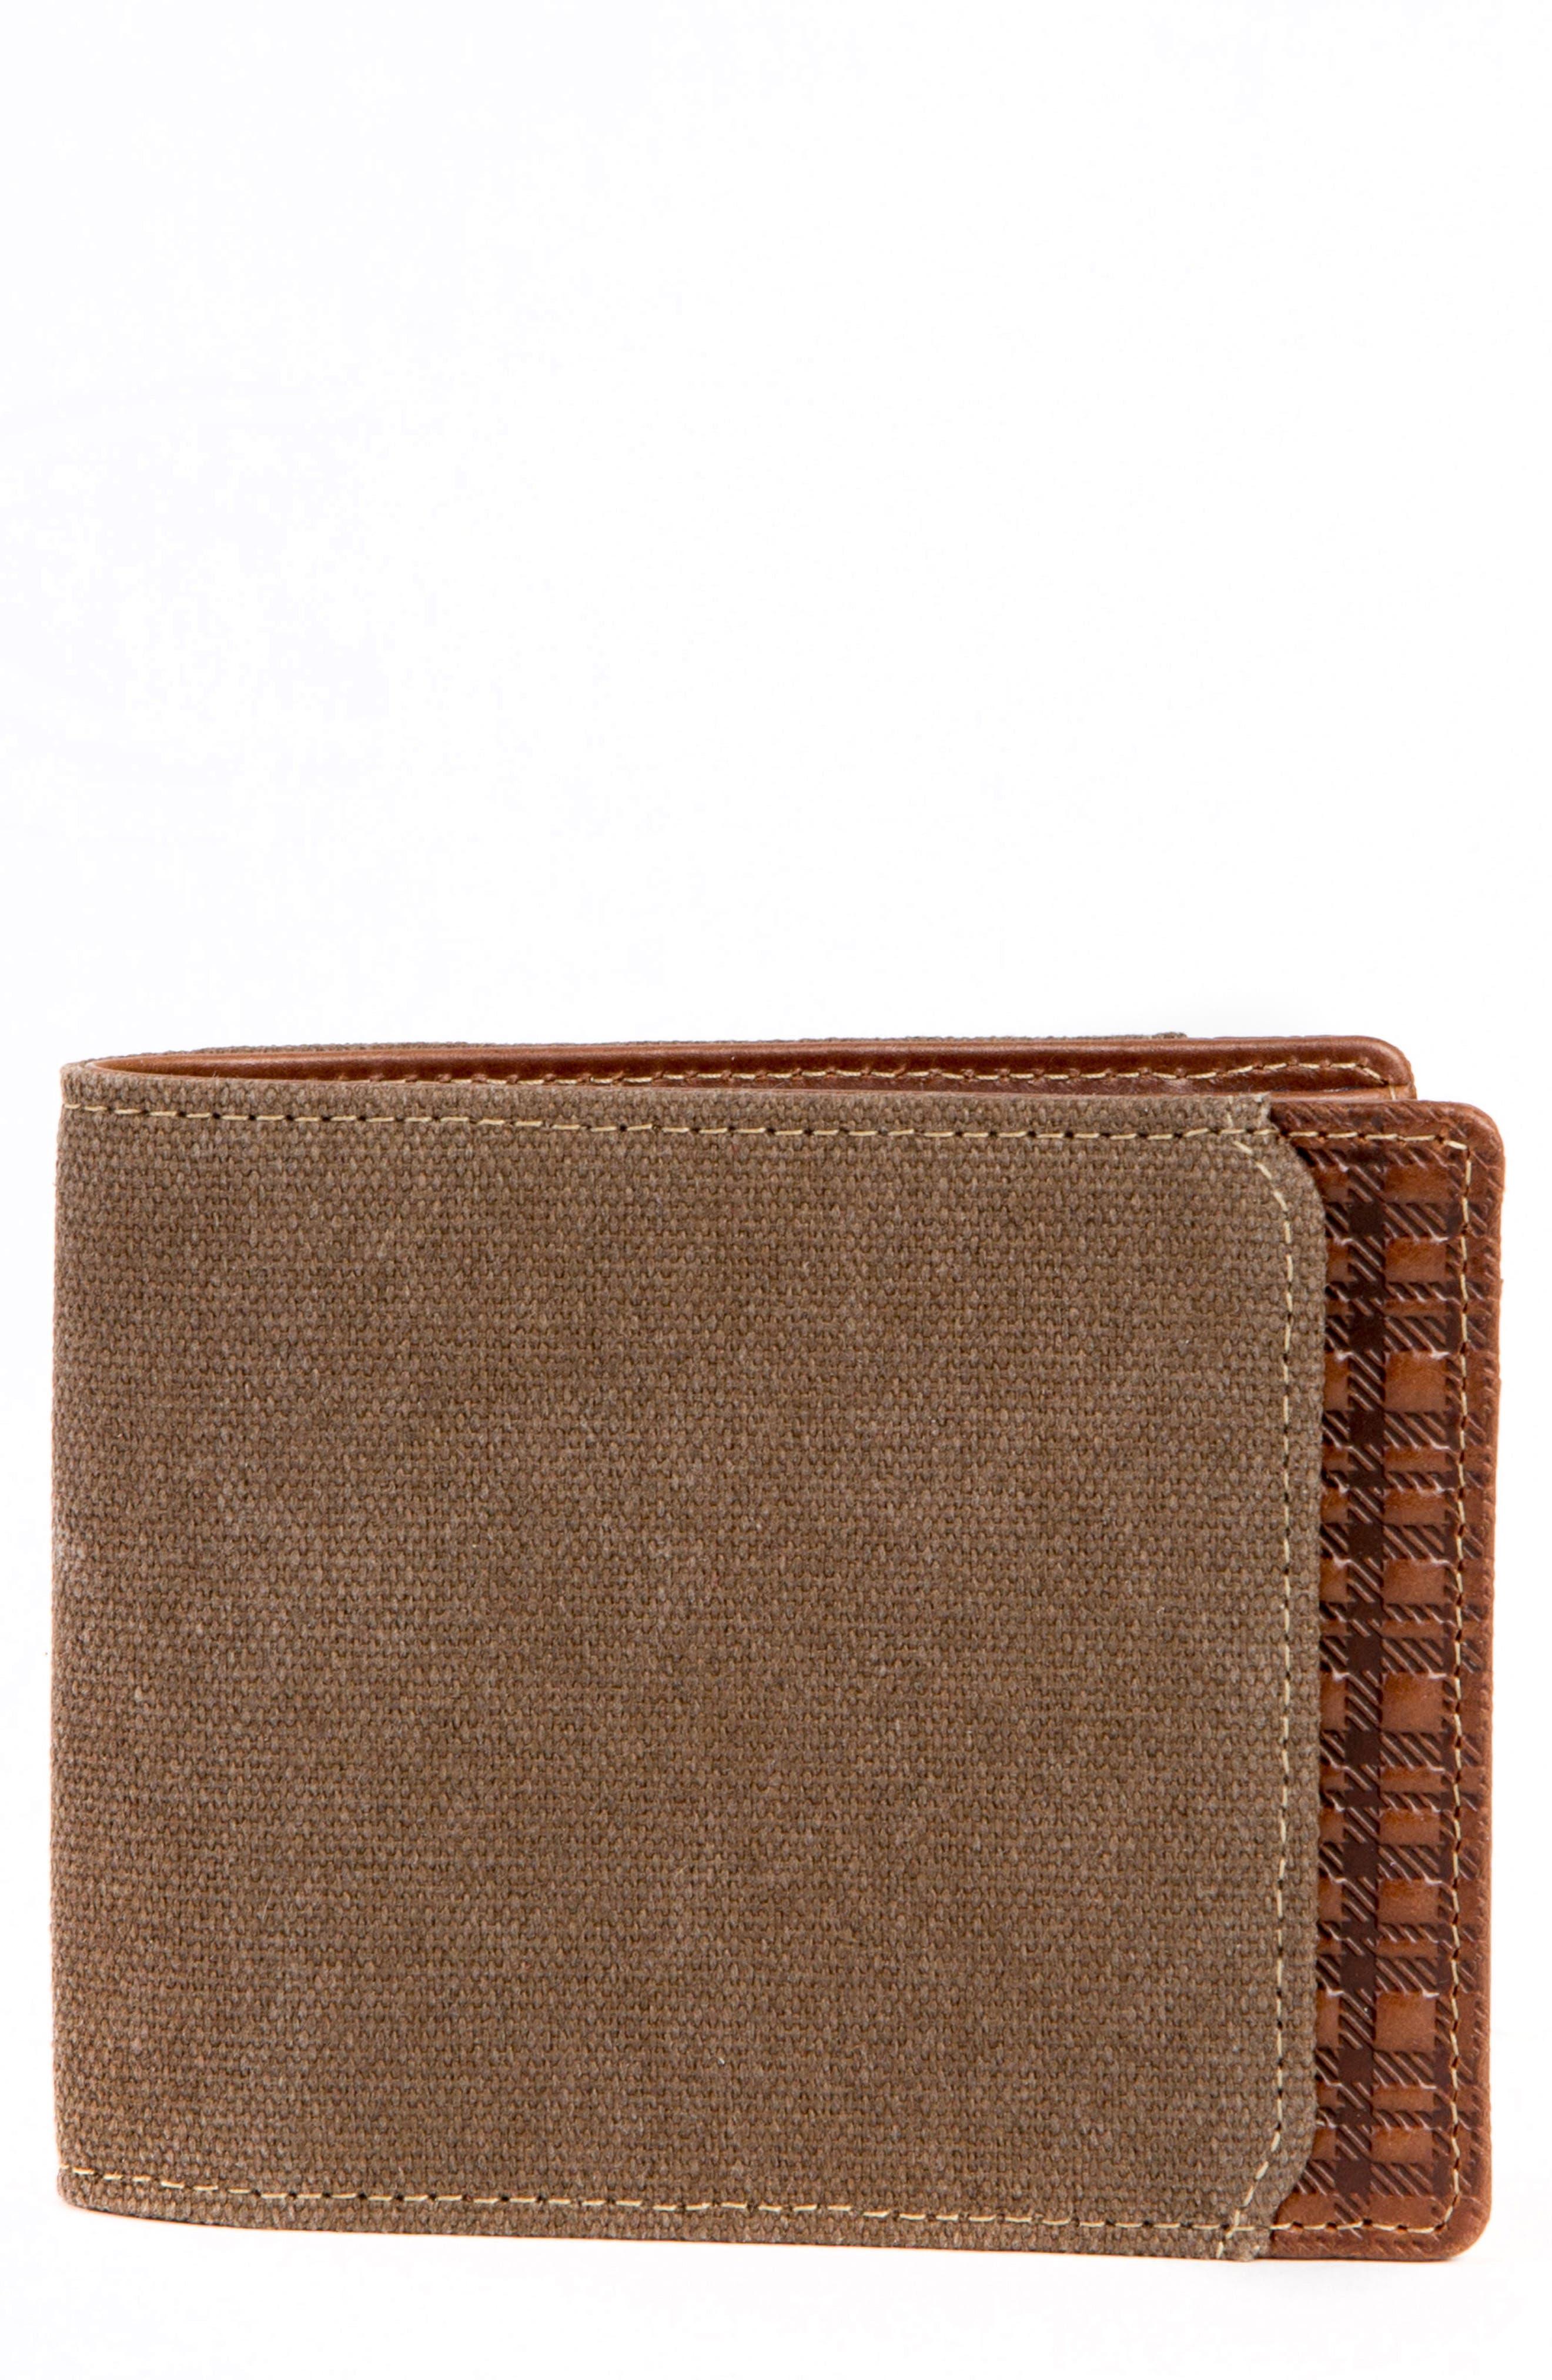 Bryant LTE Wallet,                             Main thumbnail 1, color,                             MAHOGANY/ HEATHER